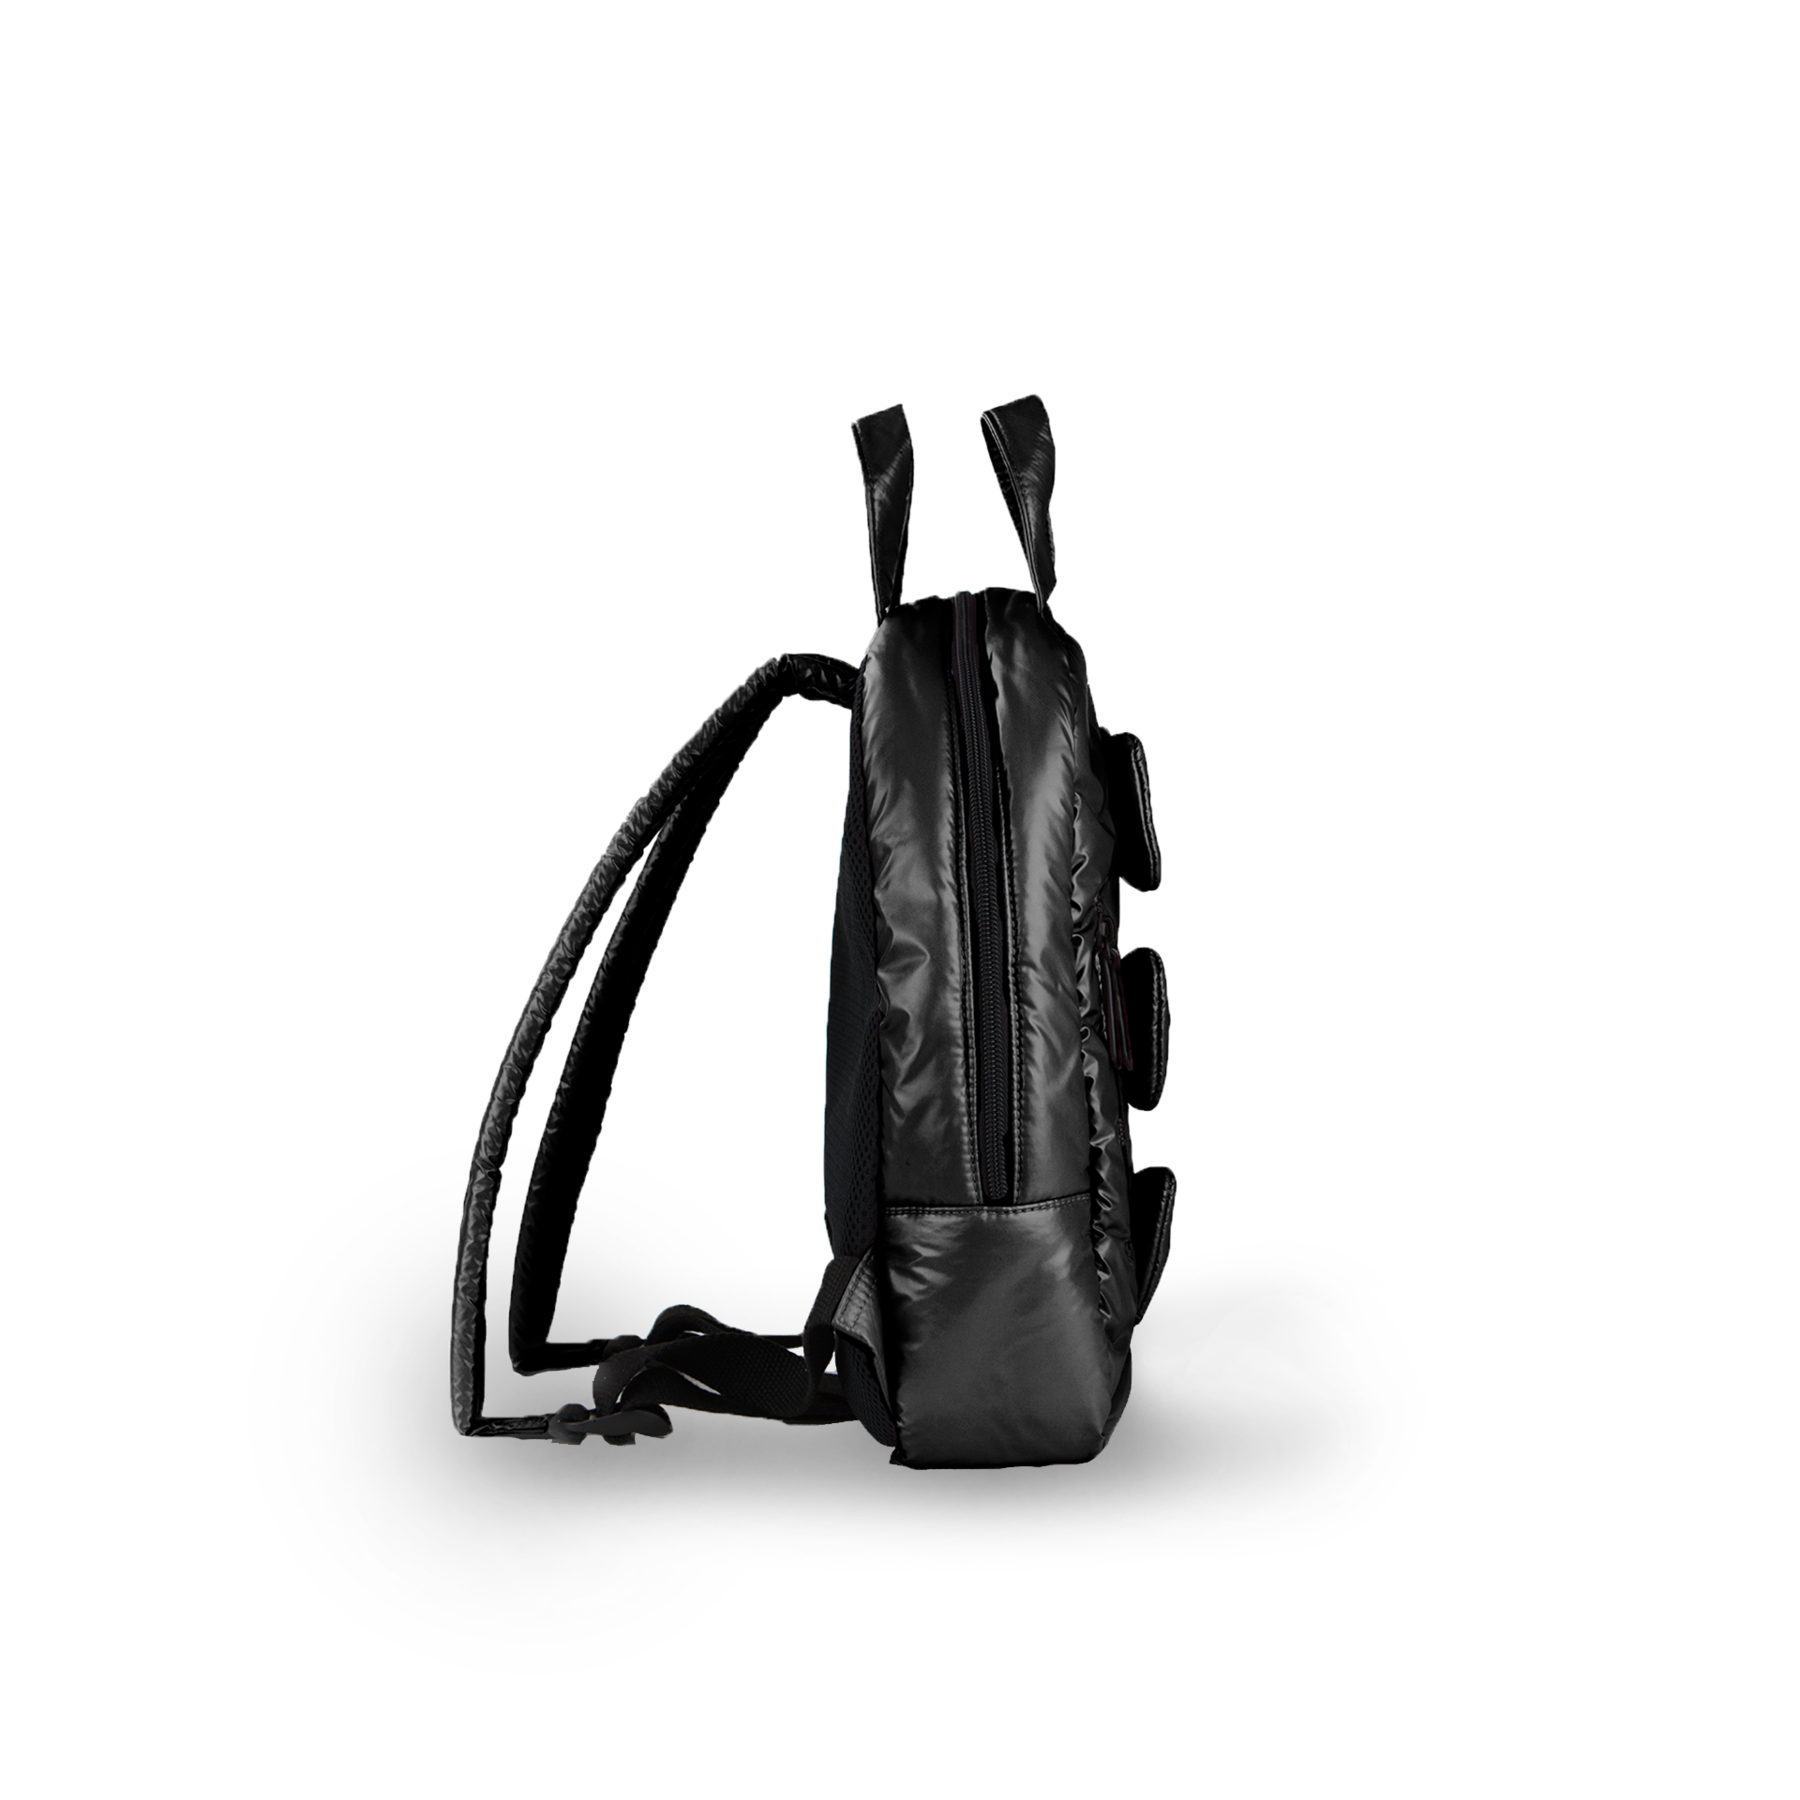 7AM - Plecak BackPack MINI BOWS Black